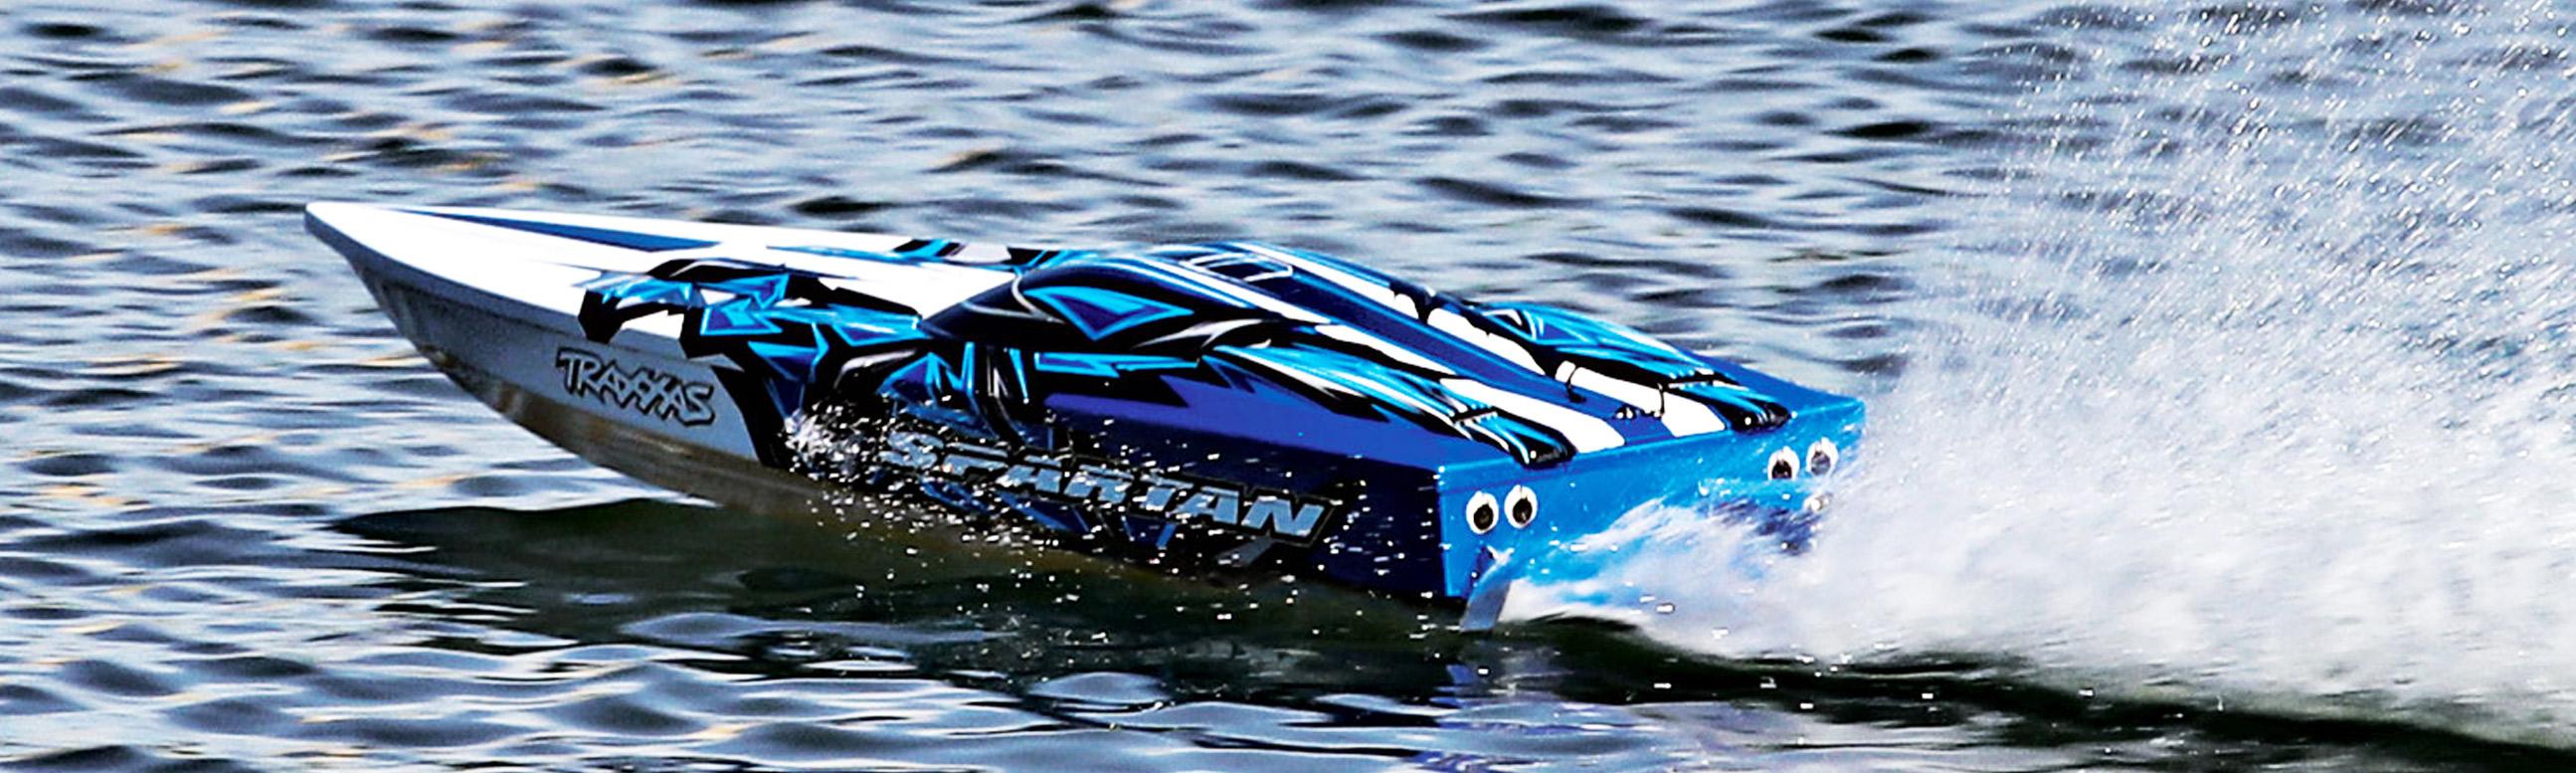 Traxxas Spartan Brushless Elbåt